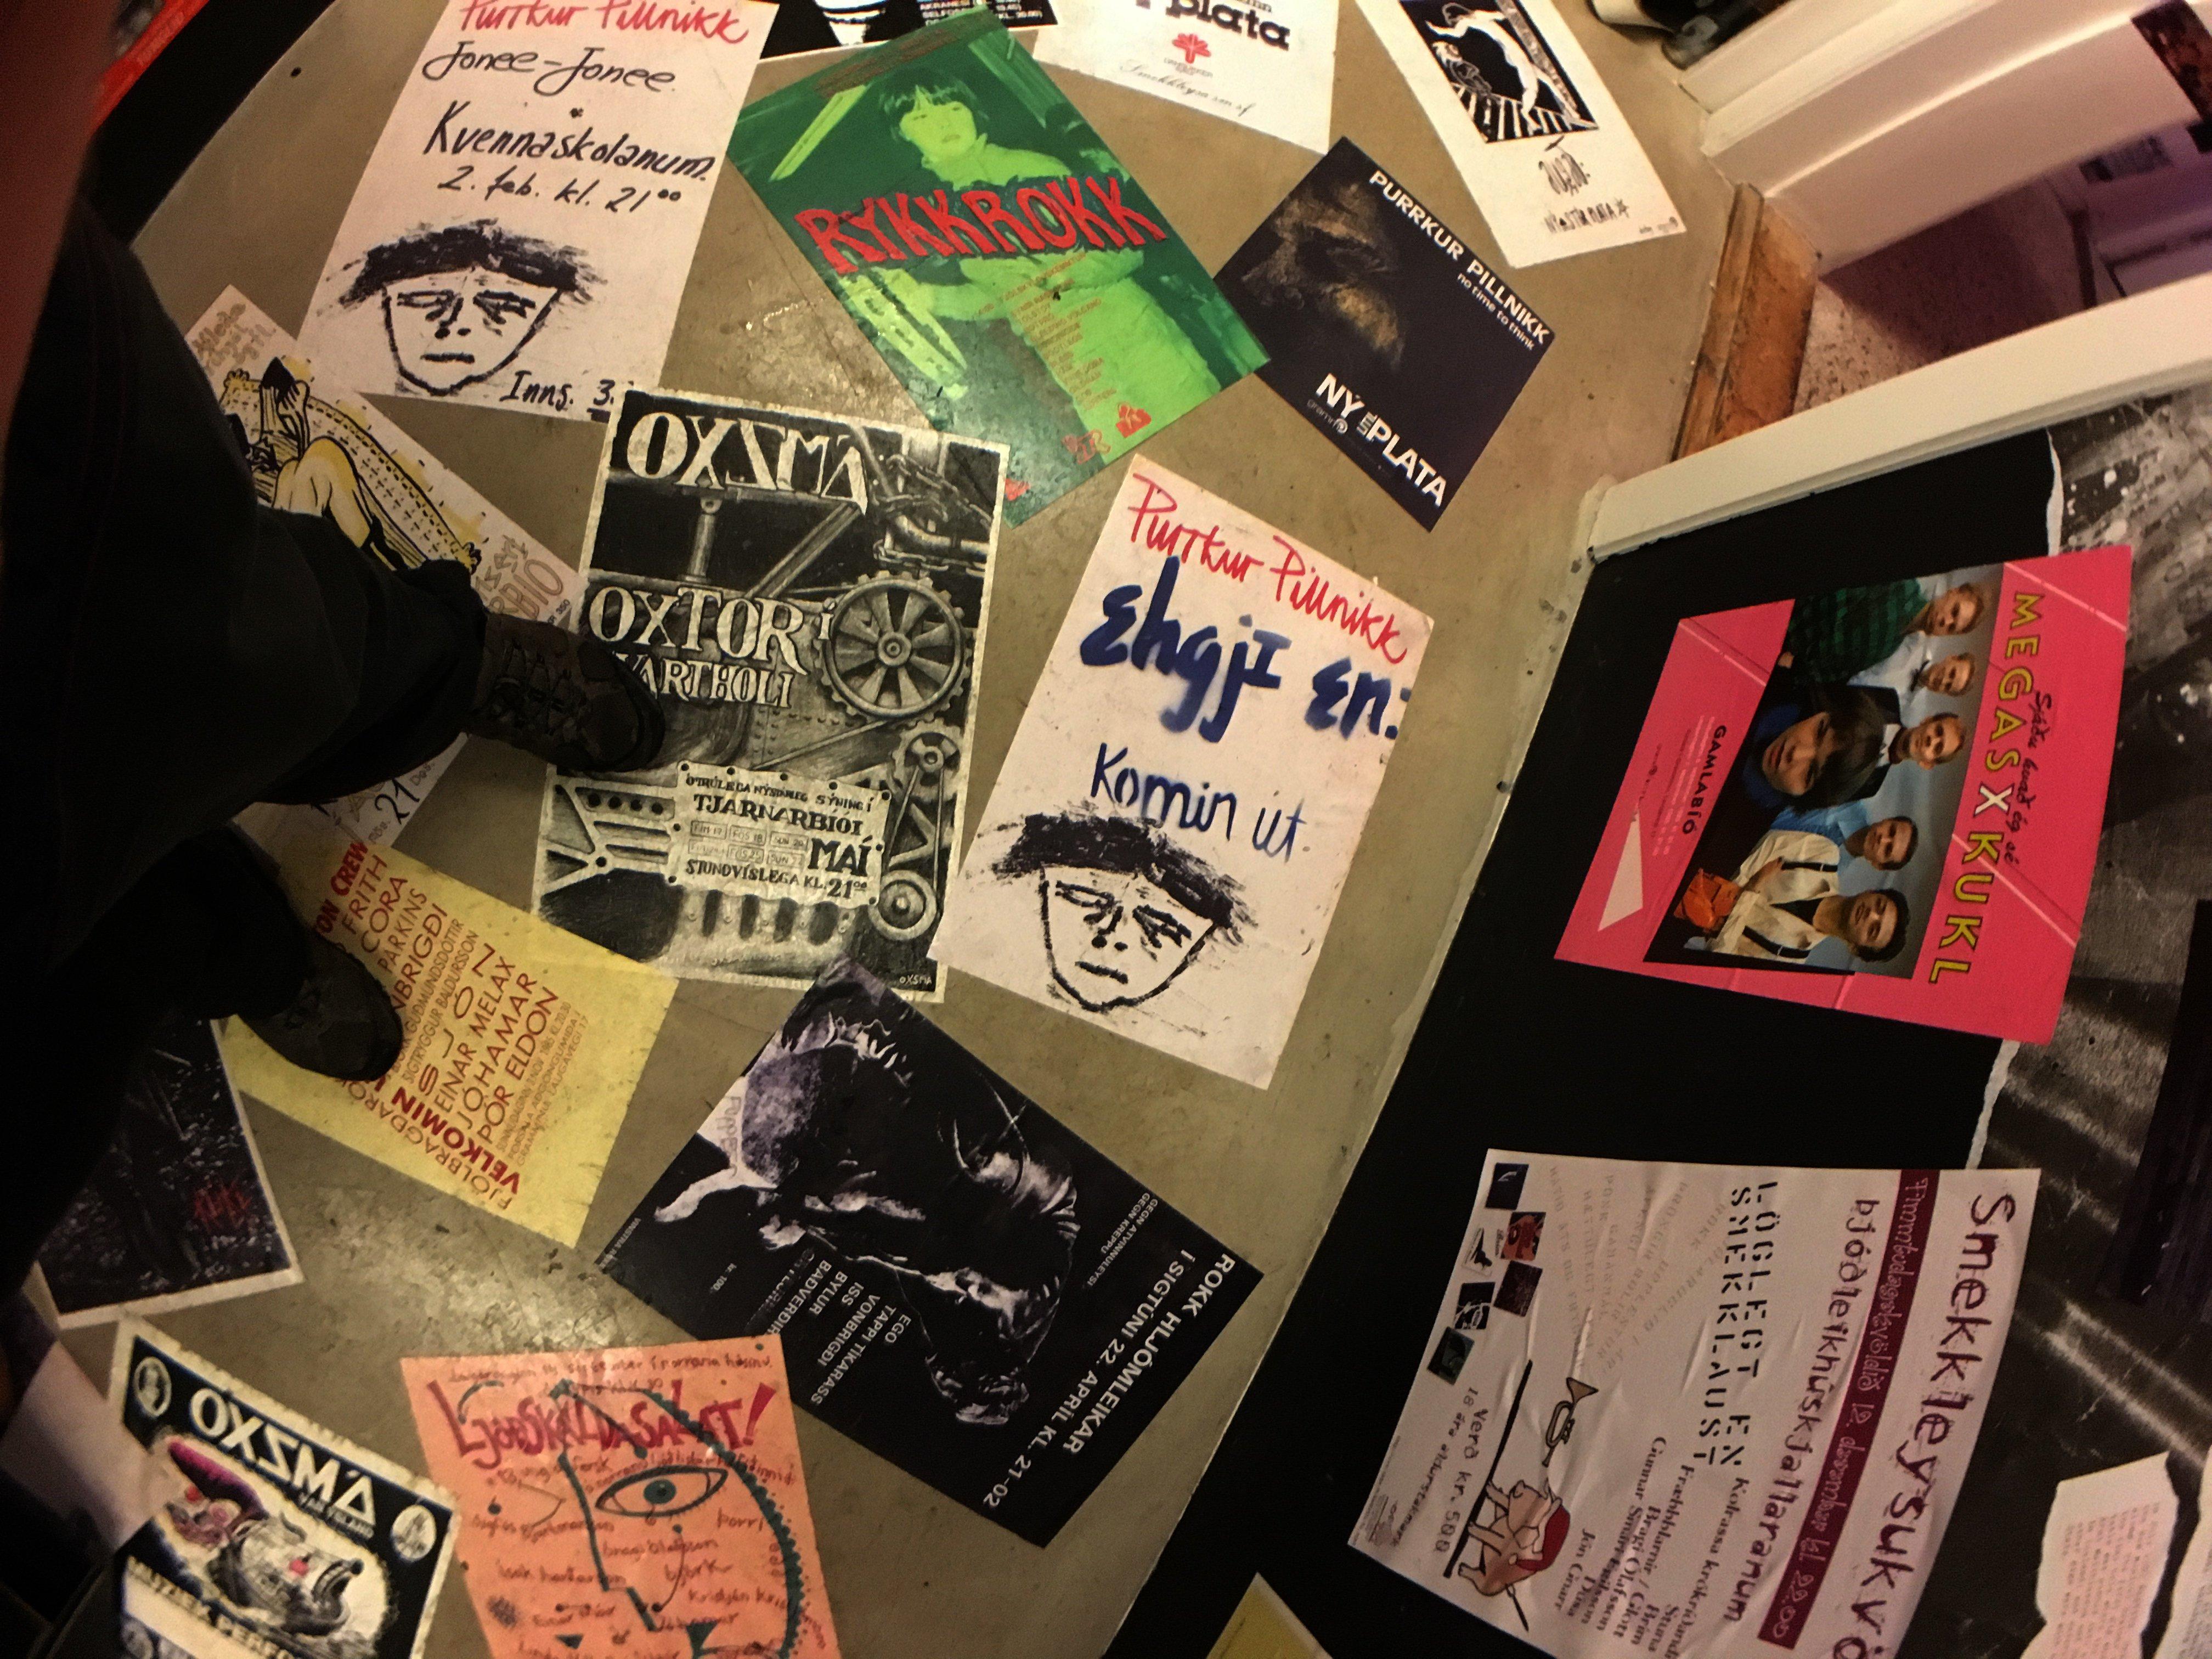 f02776347b Keep it Underground  The Icelandic Punk Museum Opens - The Reykjavik  Grapevine